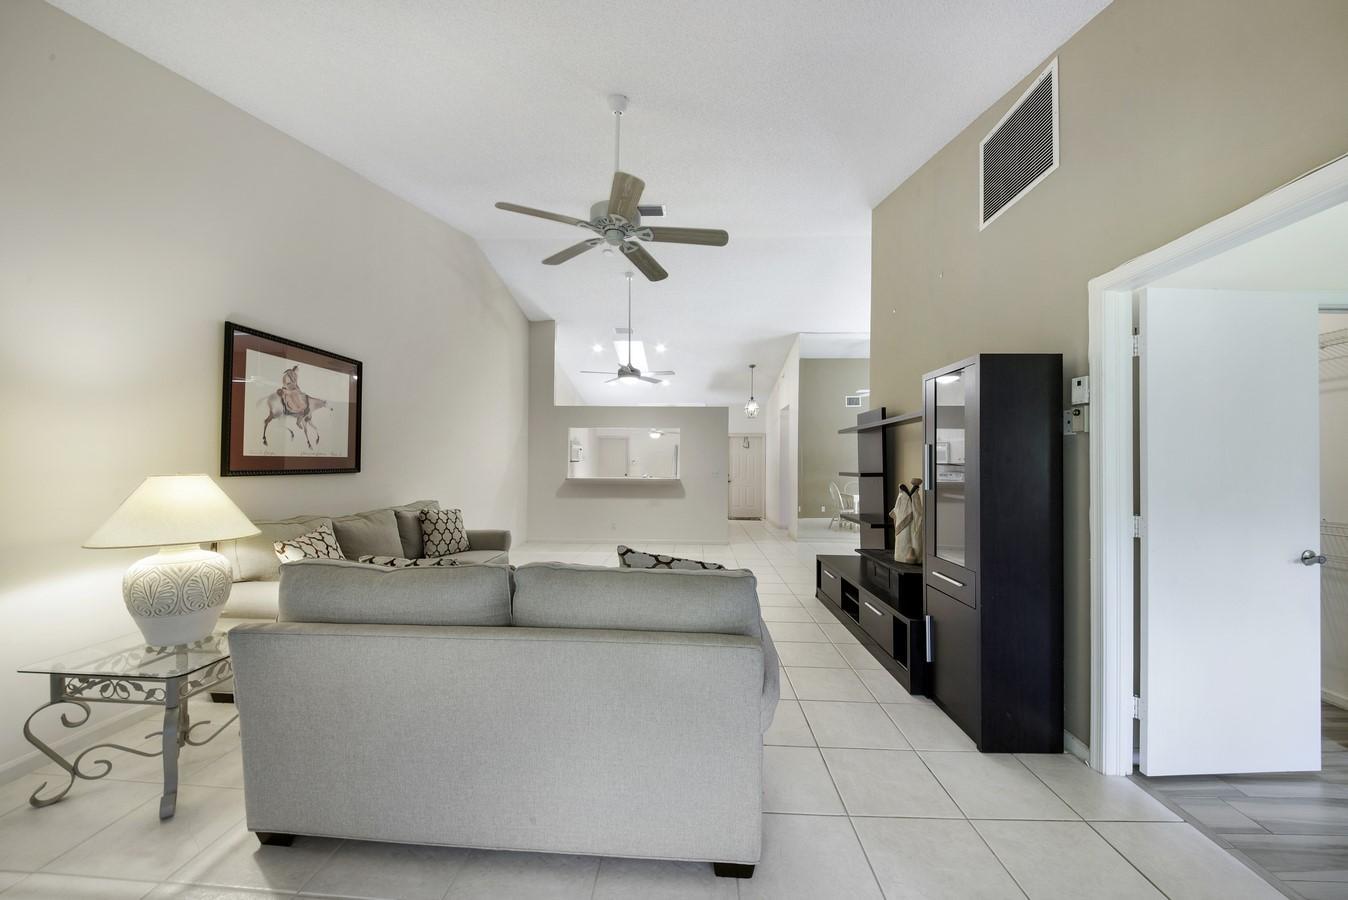 9747 Pavarotti Terrace 103 Boynton Beach, FL 33437 photo 3